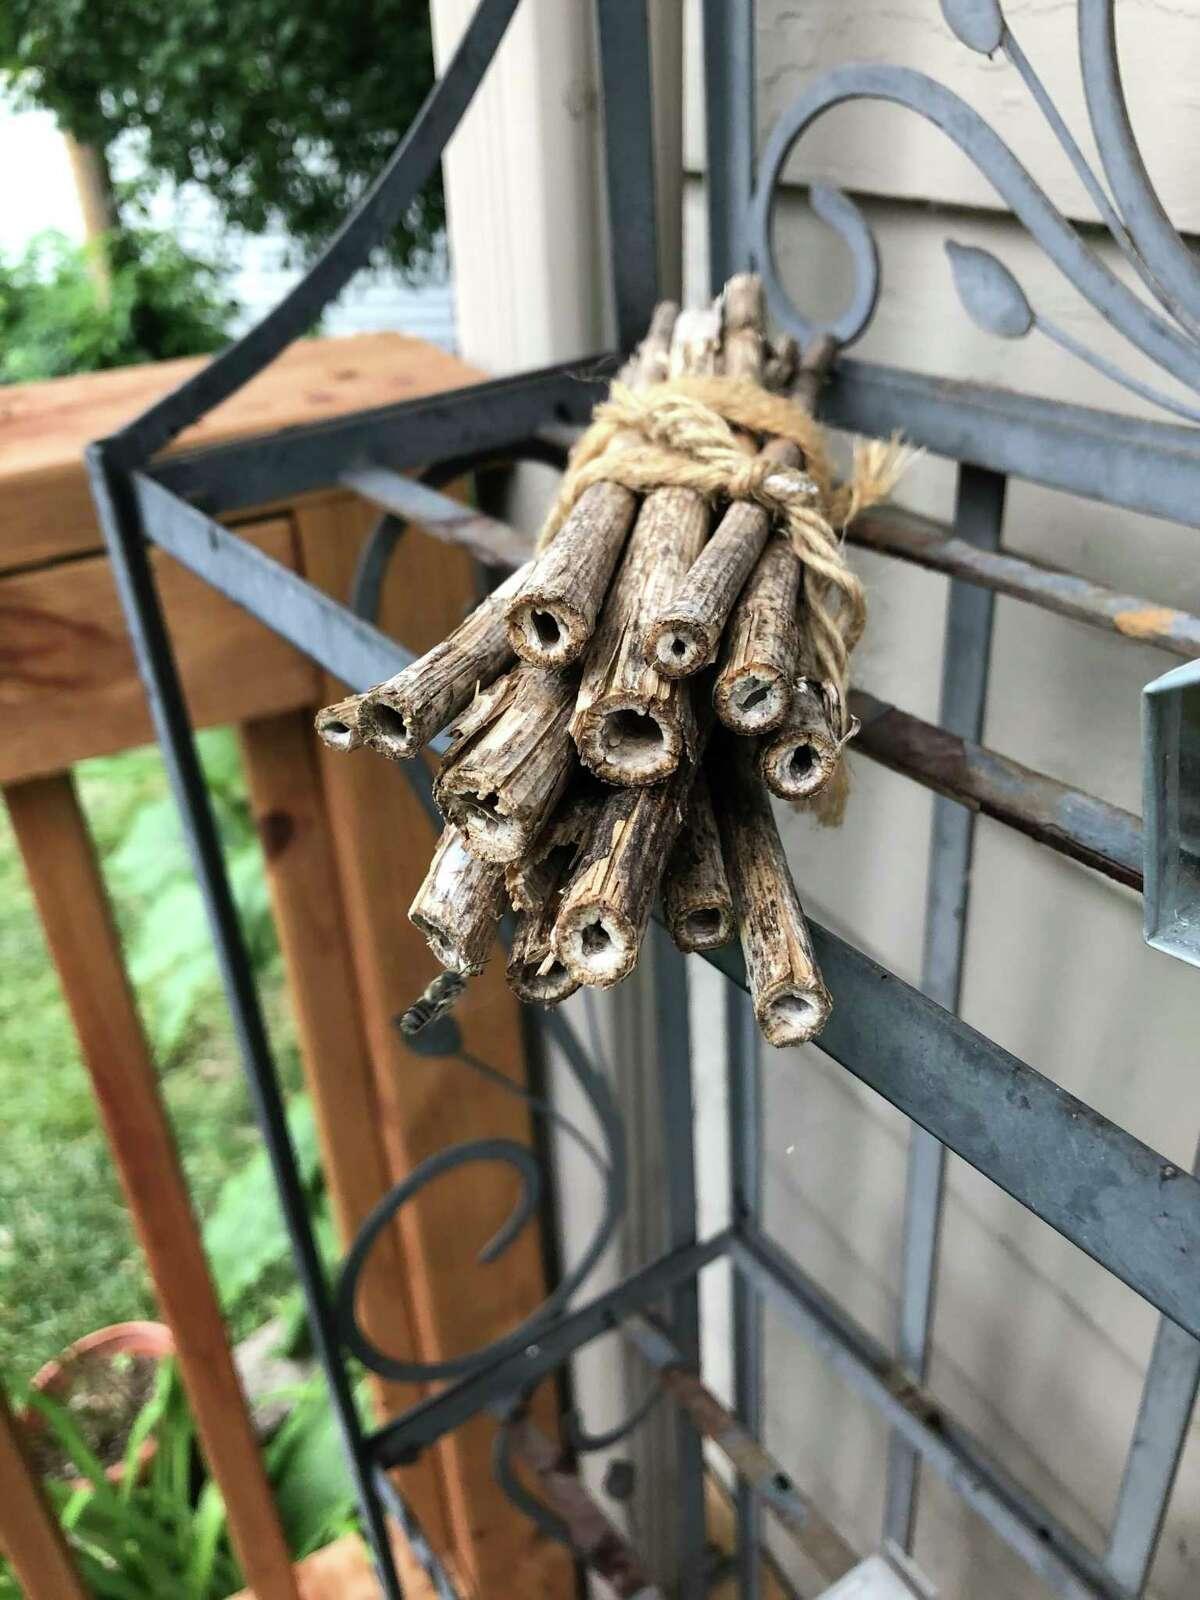 In her Nebraska garden, conservation specialist Jennifer Hopwood uses old stems of ironweed for her bee nest bundles.